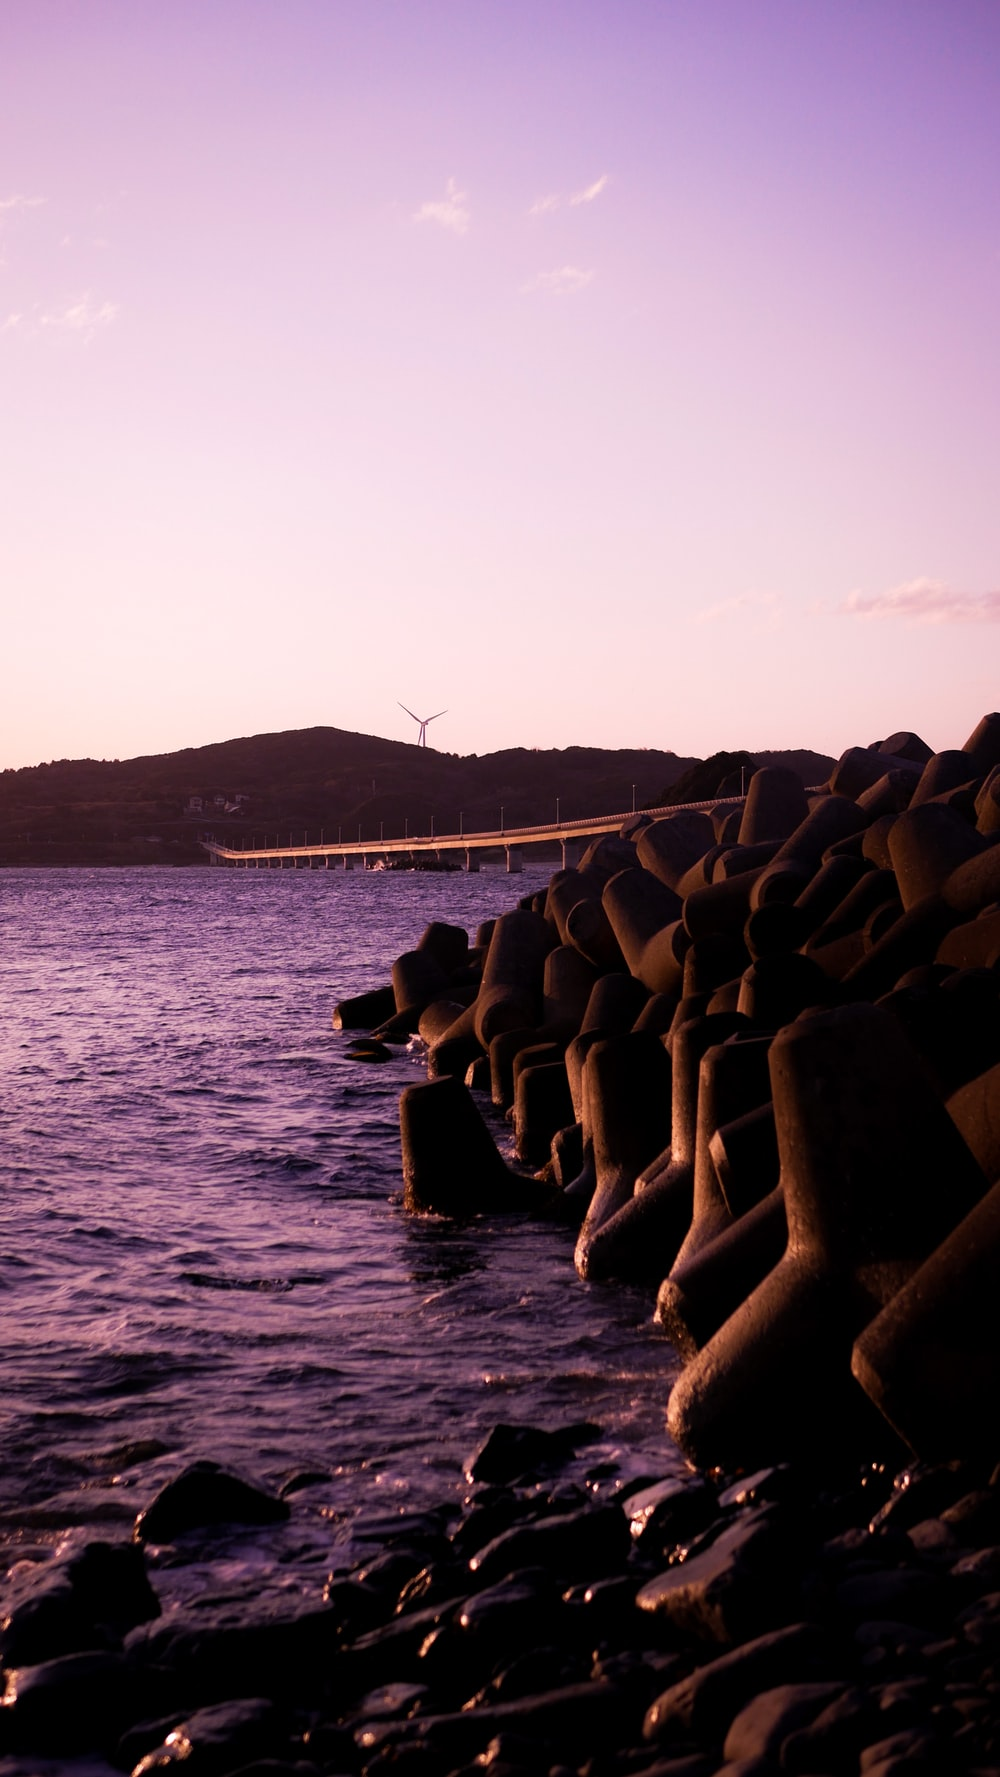 gray concrete blocks on sea shore during daytime